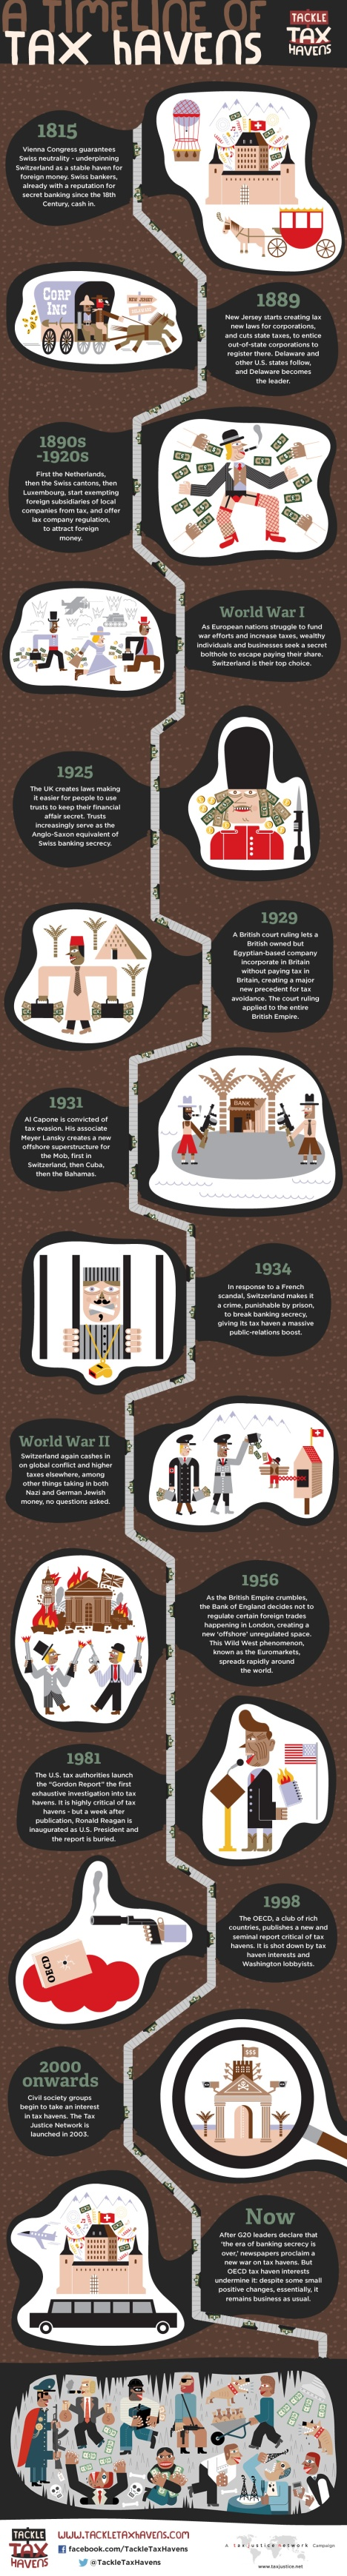 Geschichte Steueroasen - taxjustice - tth_infographic_final